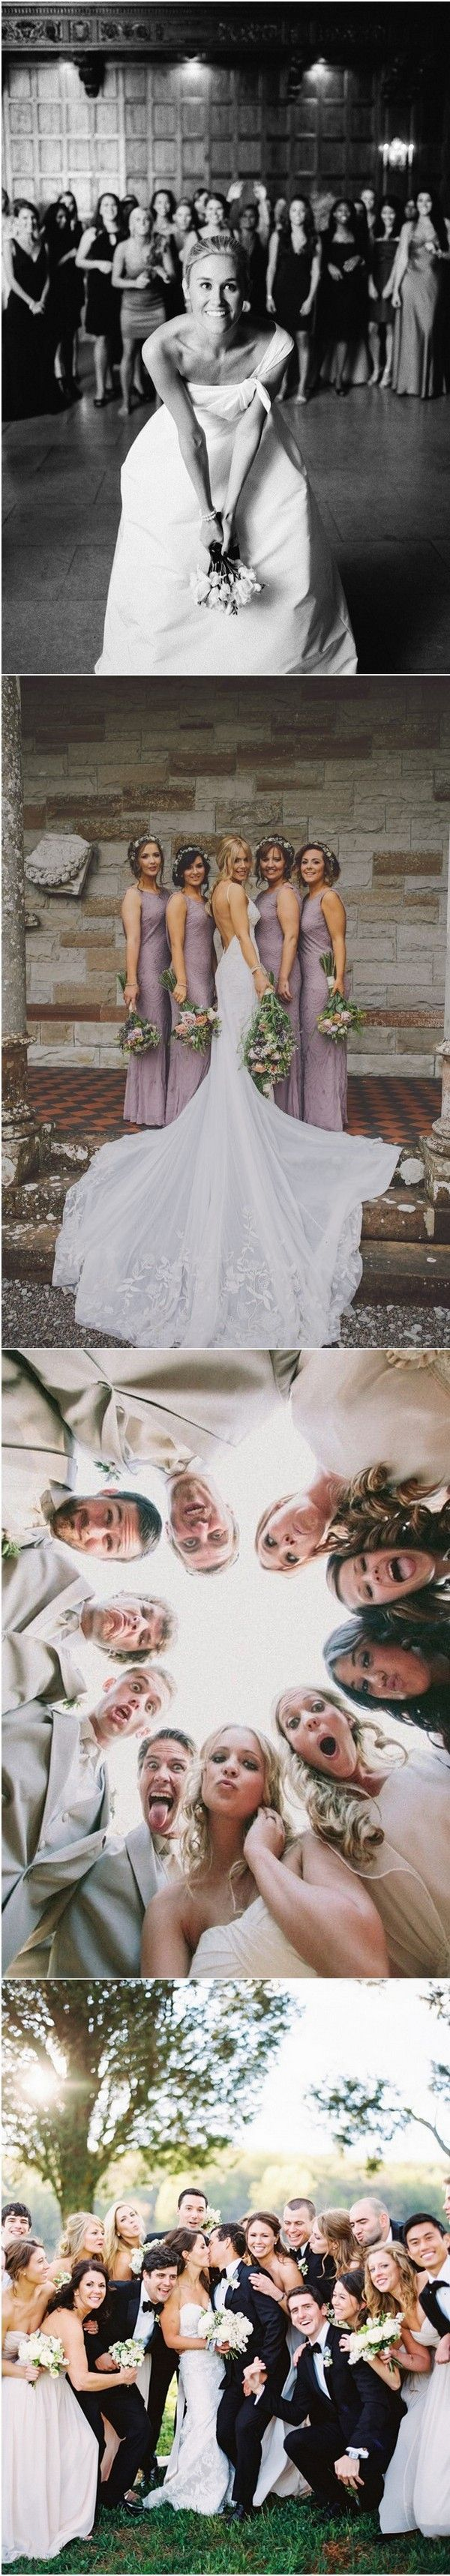 unique wedding party photo ideas